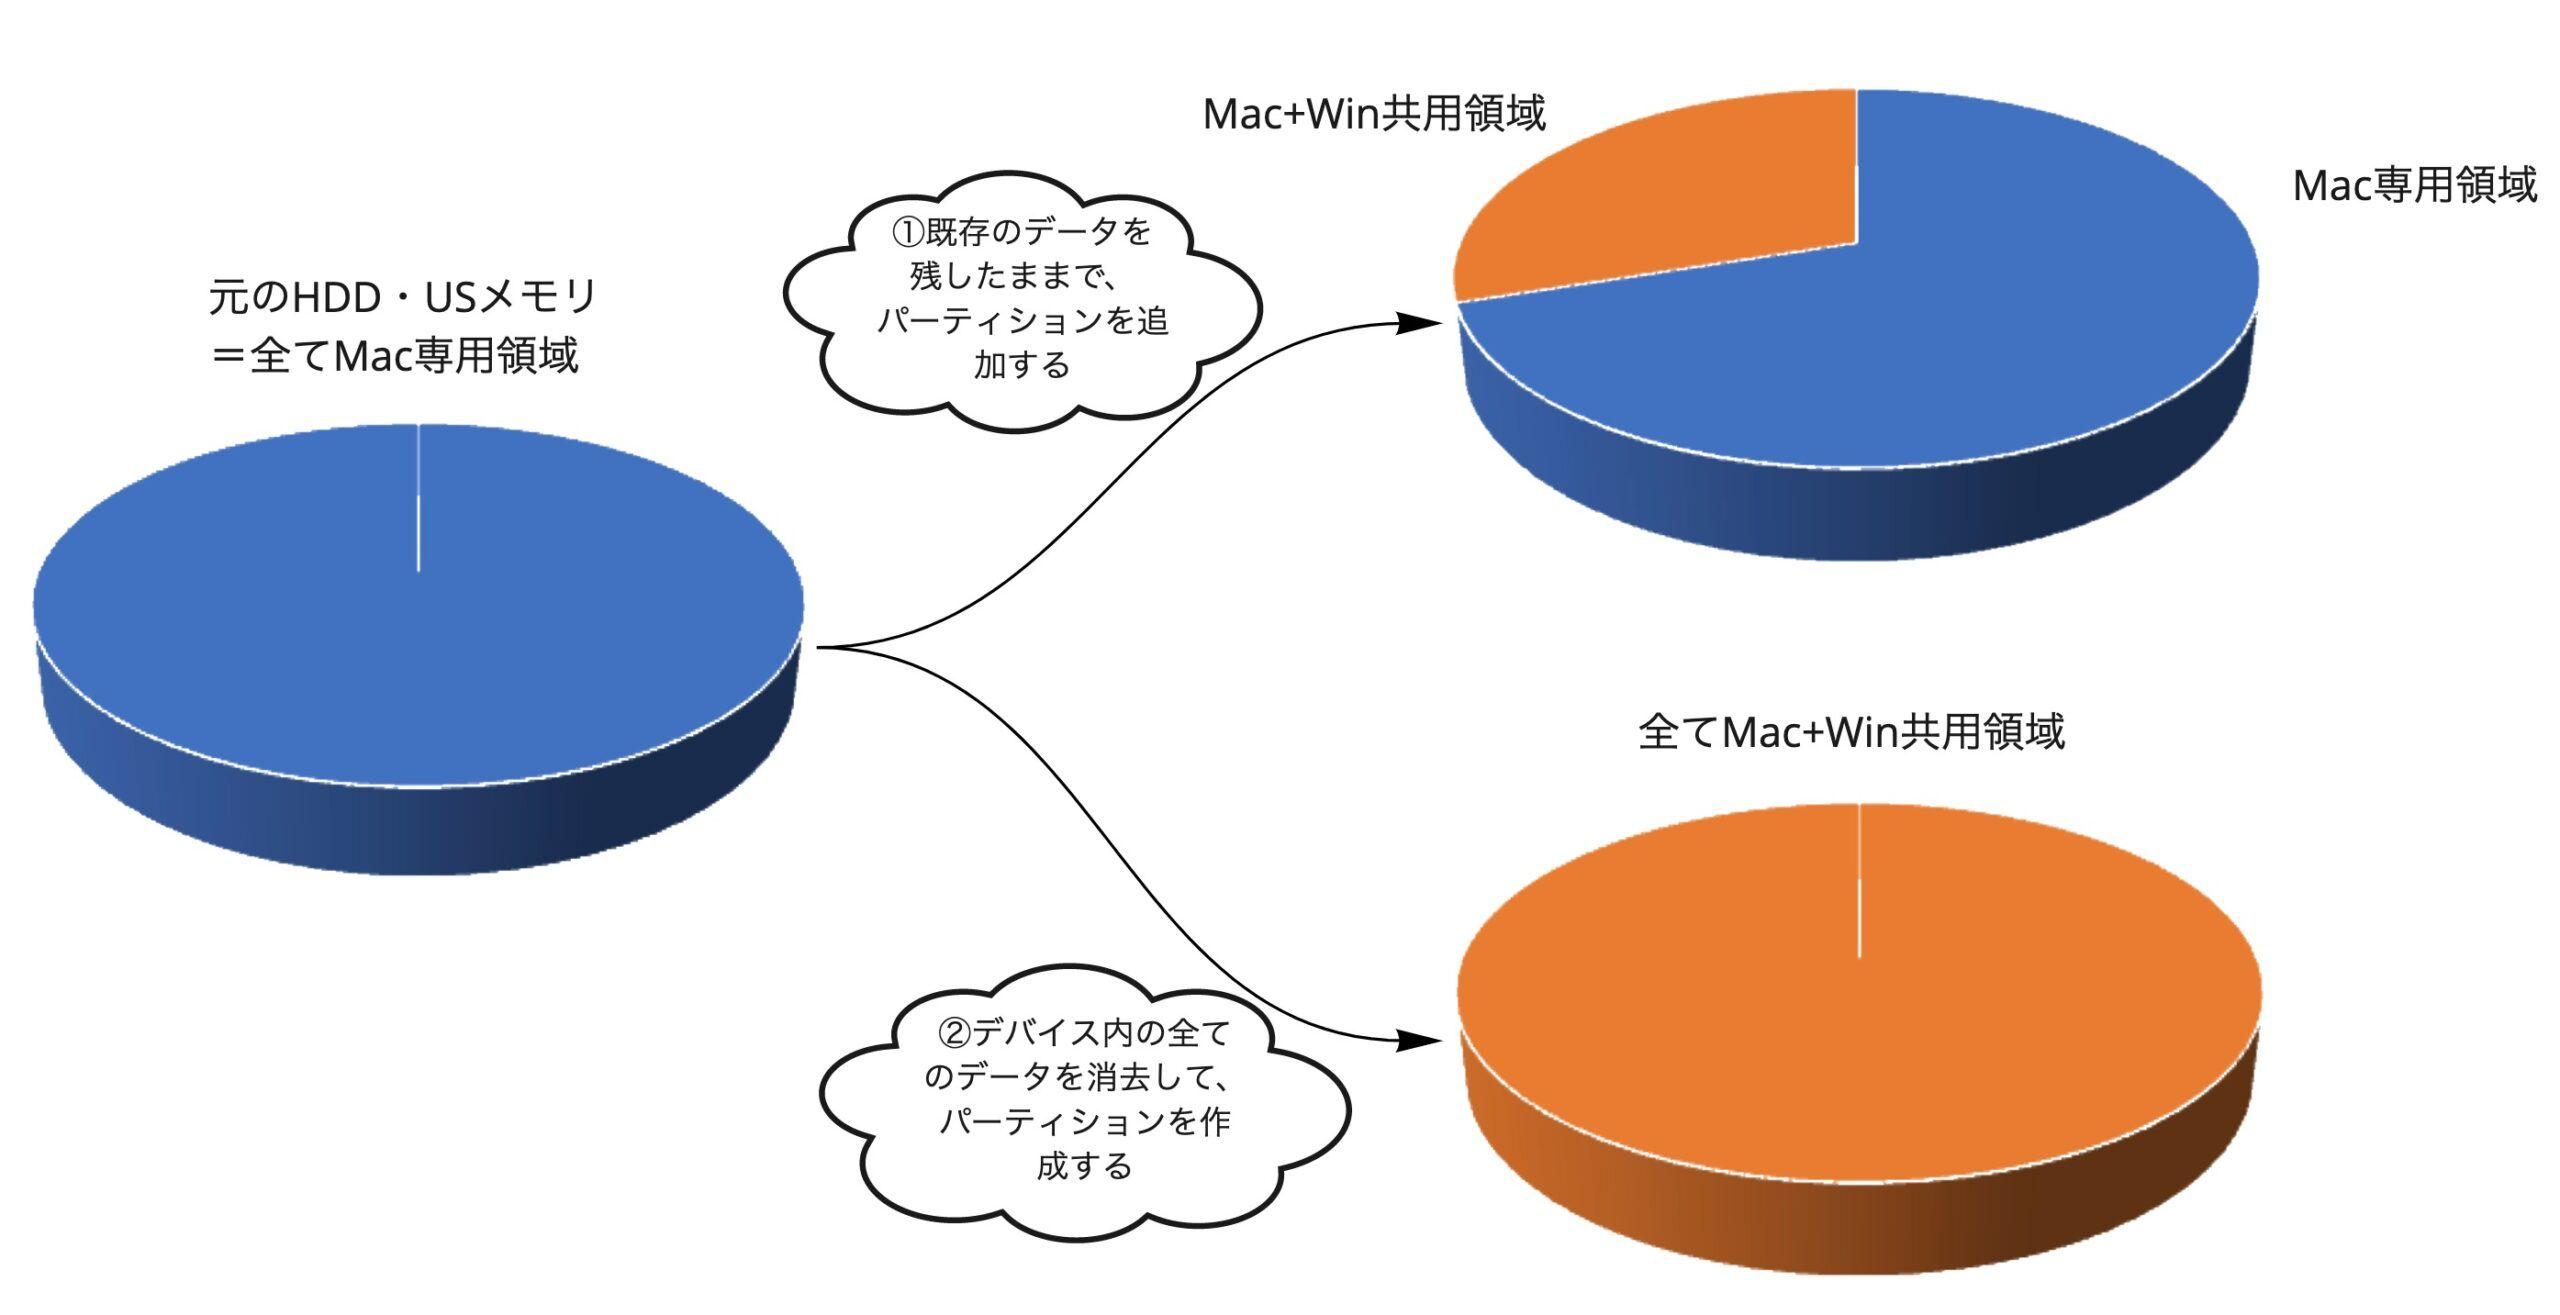 Mac+Winの共用パーティションを作成するイメージ図